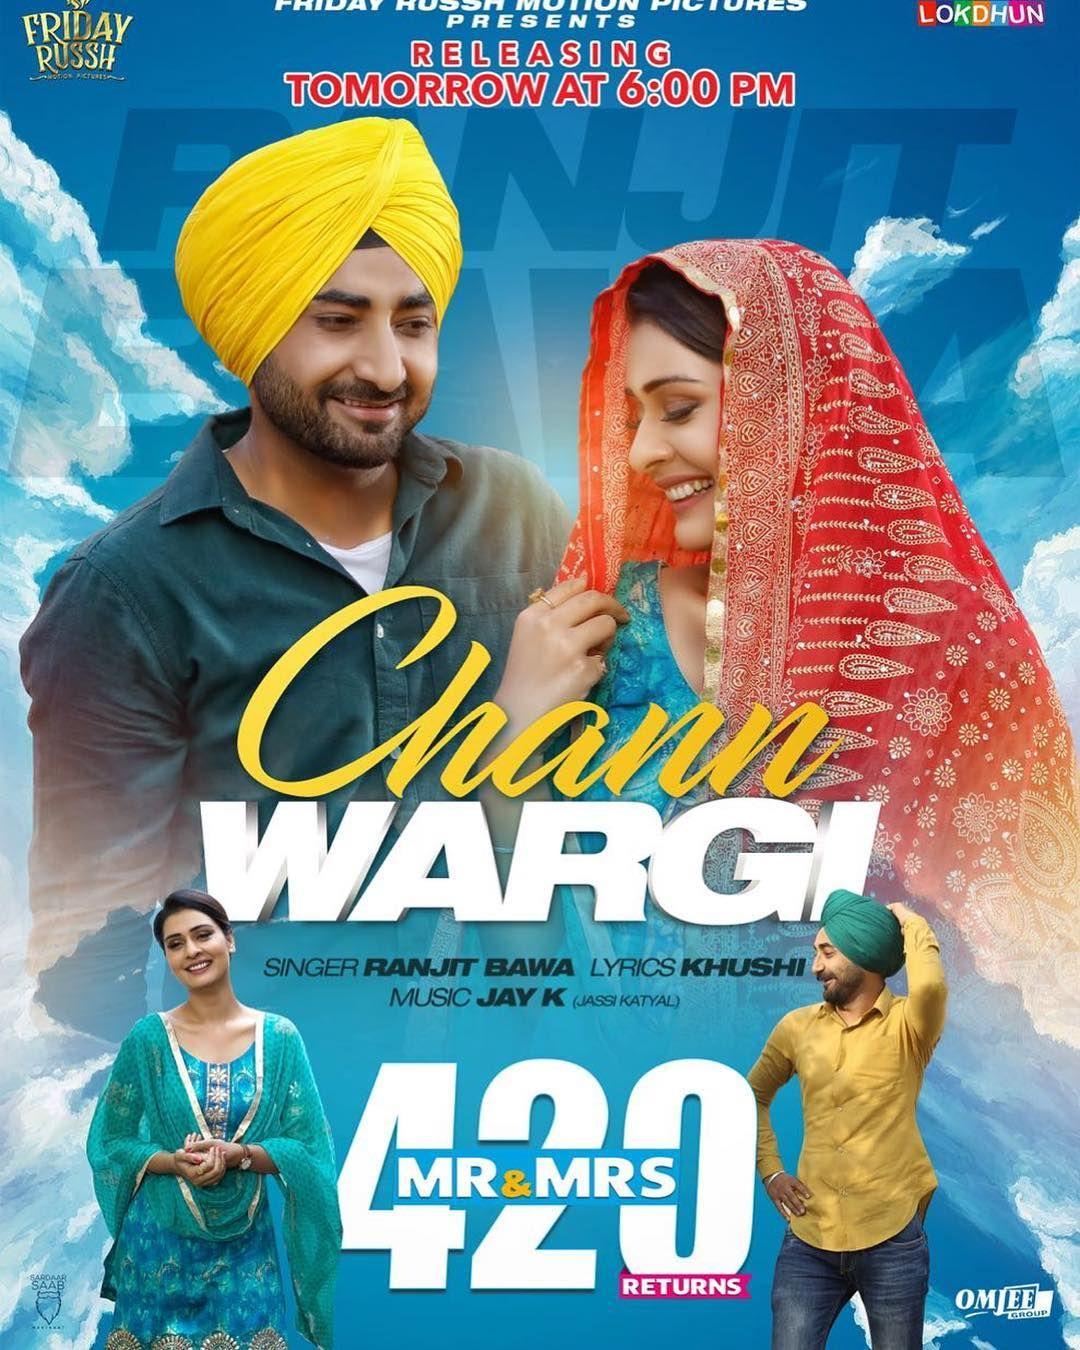 Chan Wargi Mp3 Song Belongs New Punjabi Songs Chan Wargi By Ranjit Bawa Chan Wargi Available To Free Download On Djbaap C Mp3 Song Songs Movie Songs